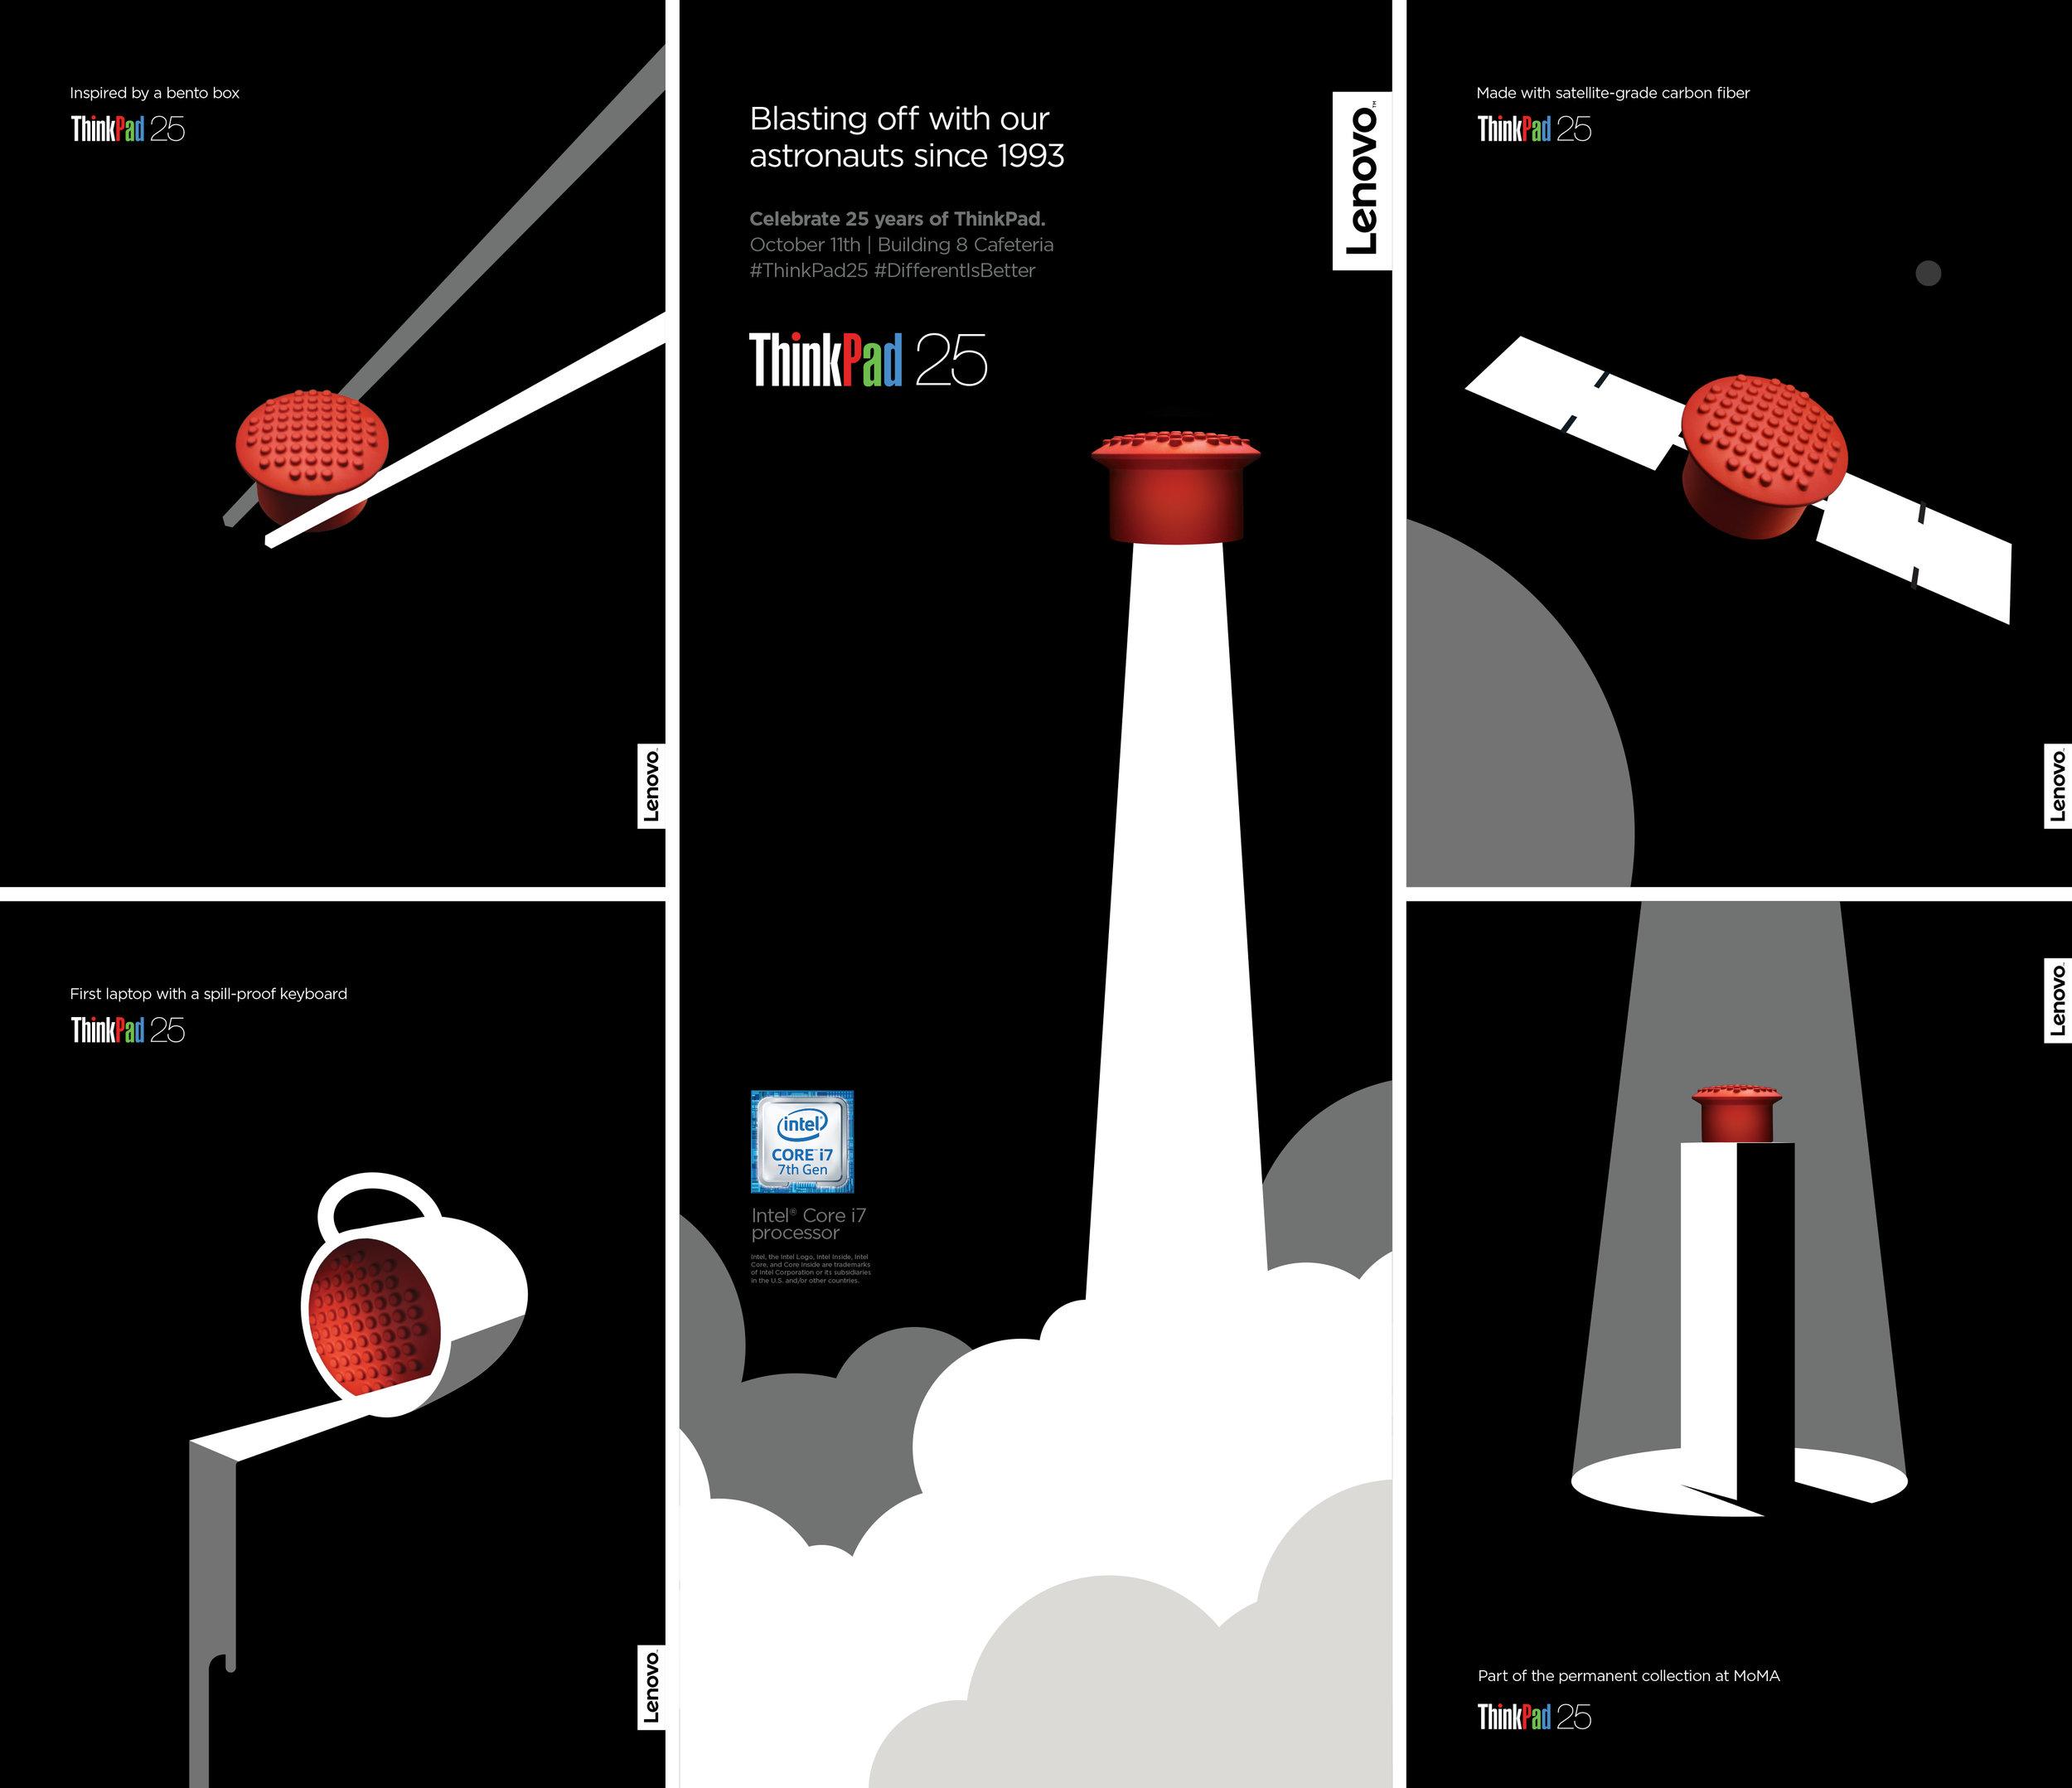 ThinkPad 25 Posters.jpg